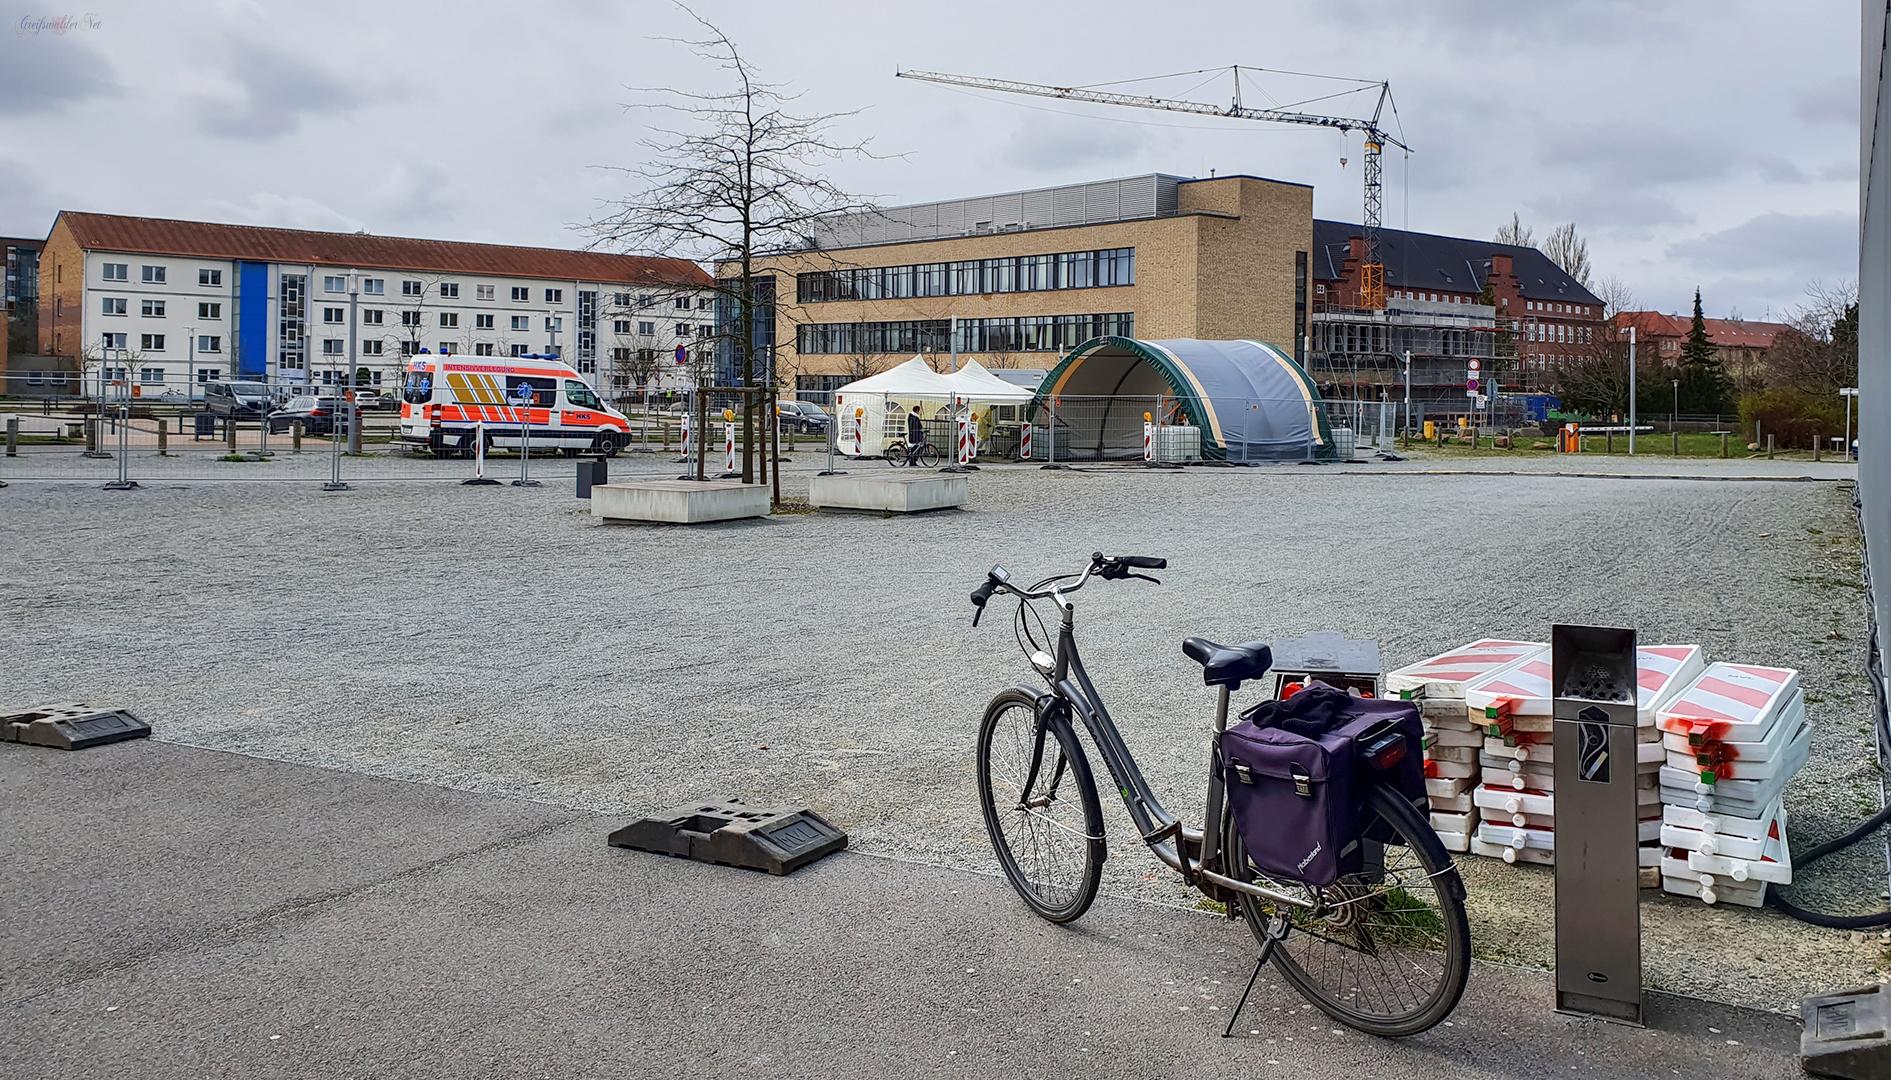 Ruhe am Universitätsklinikum Greifswald